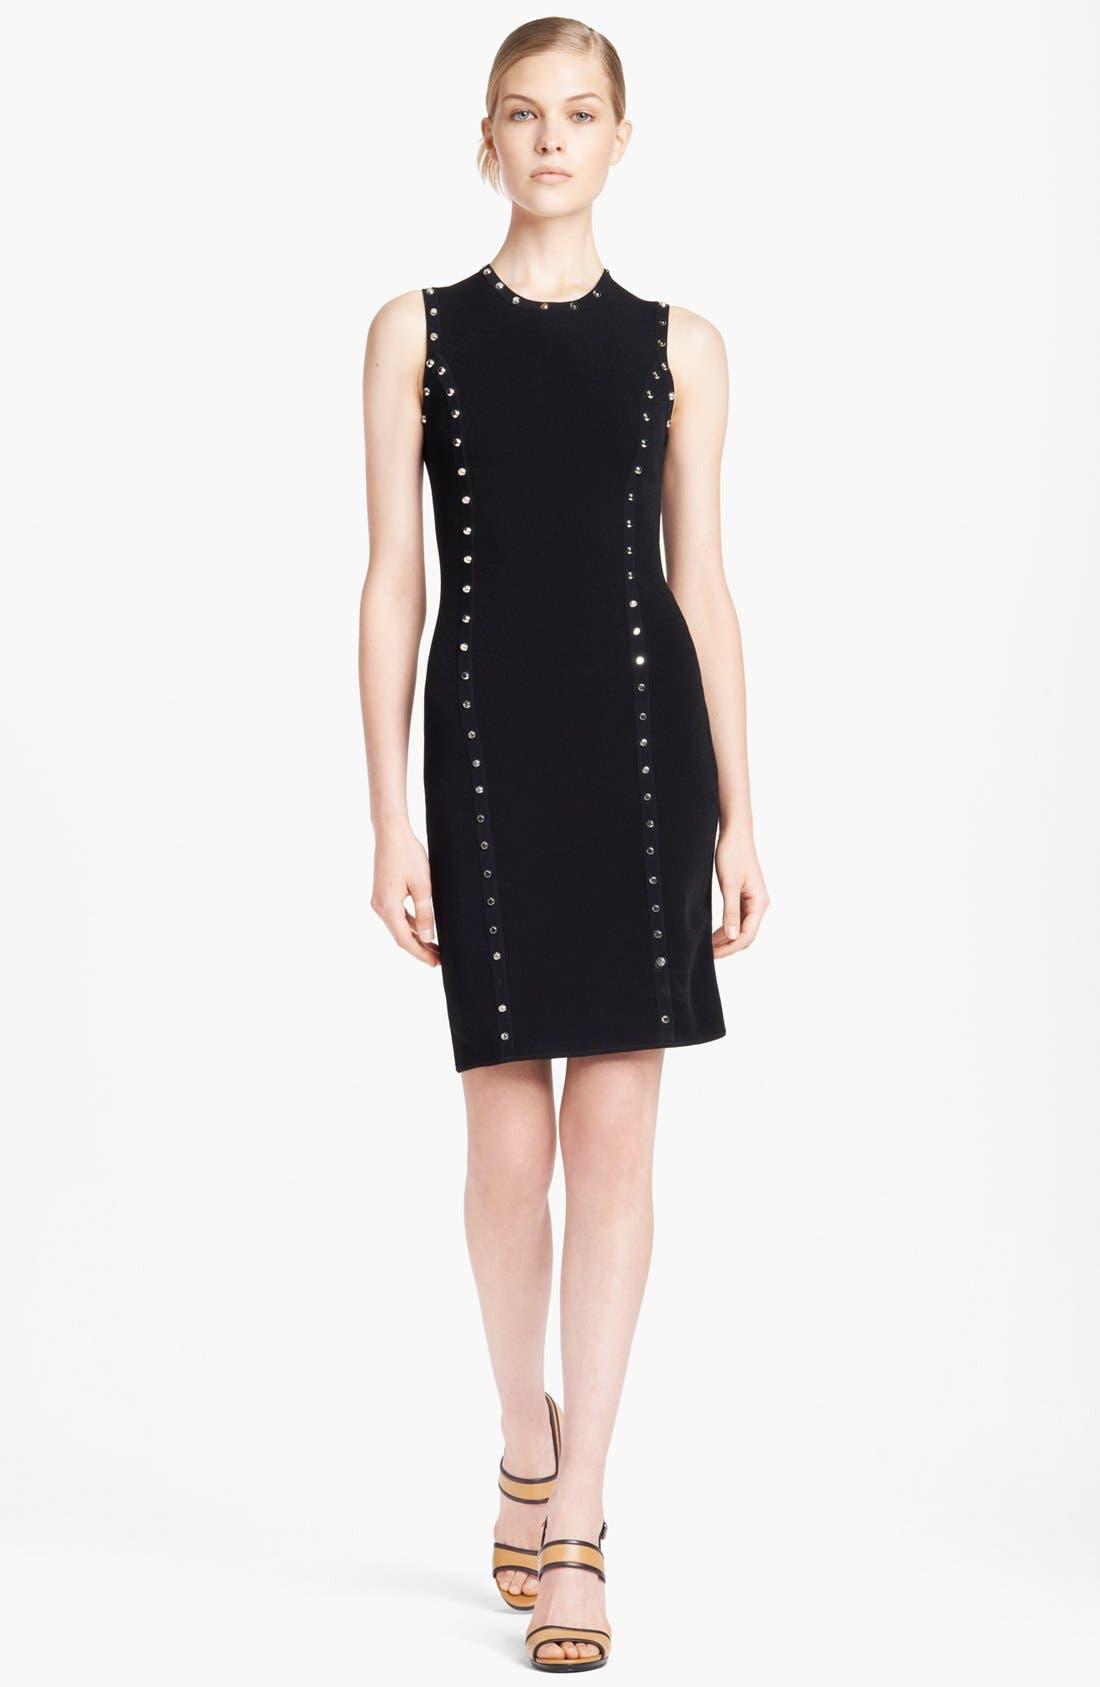 Alternate Image 1 Selected - Michael Kors Studded Knit Dress